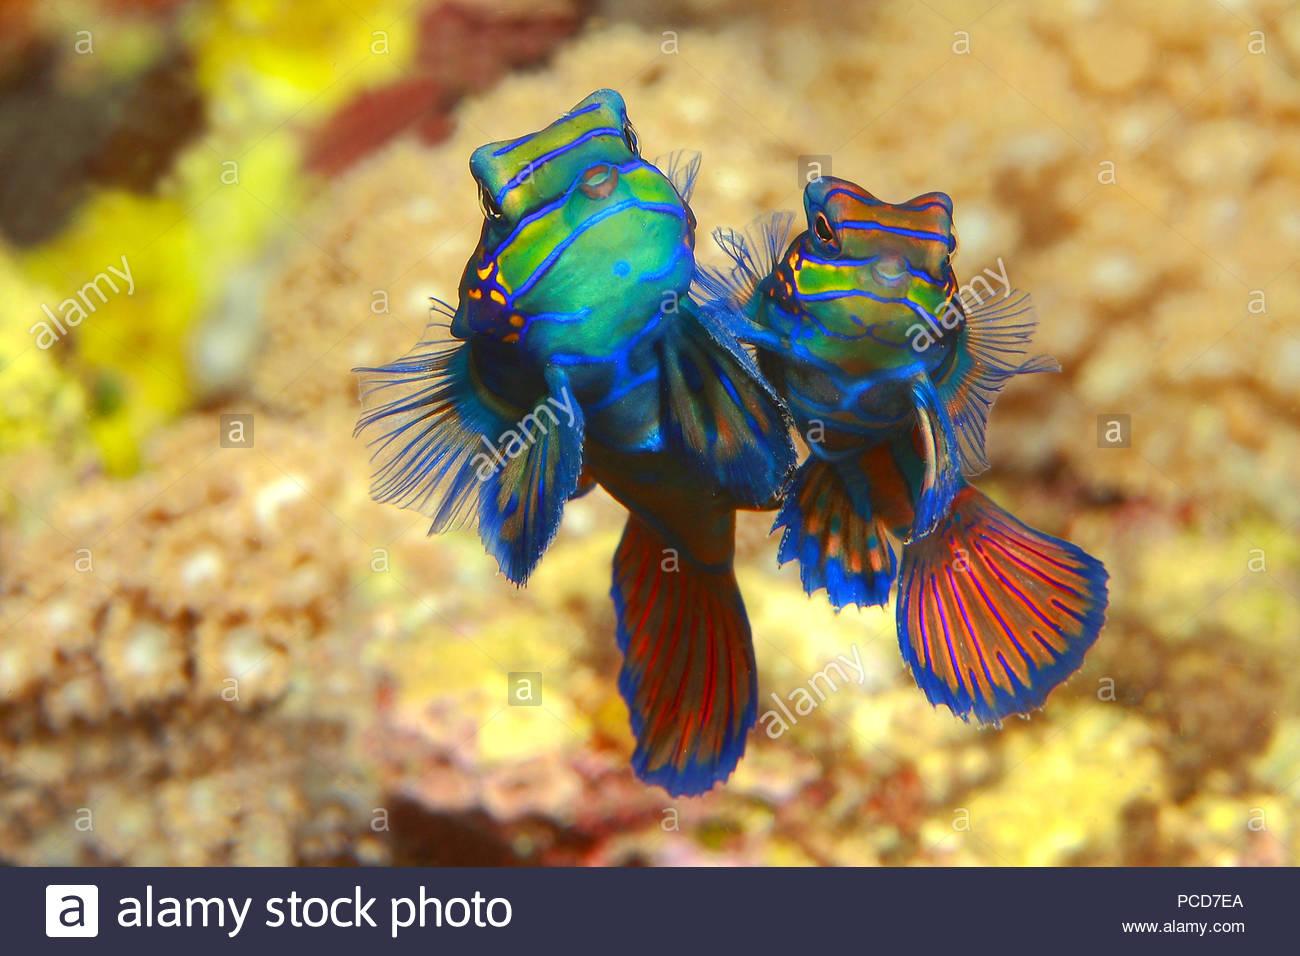 Mandarinfishes or mandarin dragonets (Synchiropus splendidus), mating, inseminating, Sabang Beach, Mindoro, Philippines Stock Photo